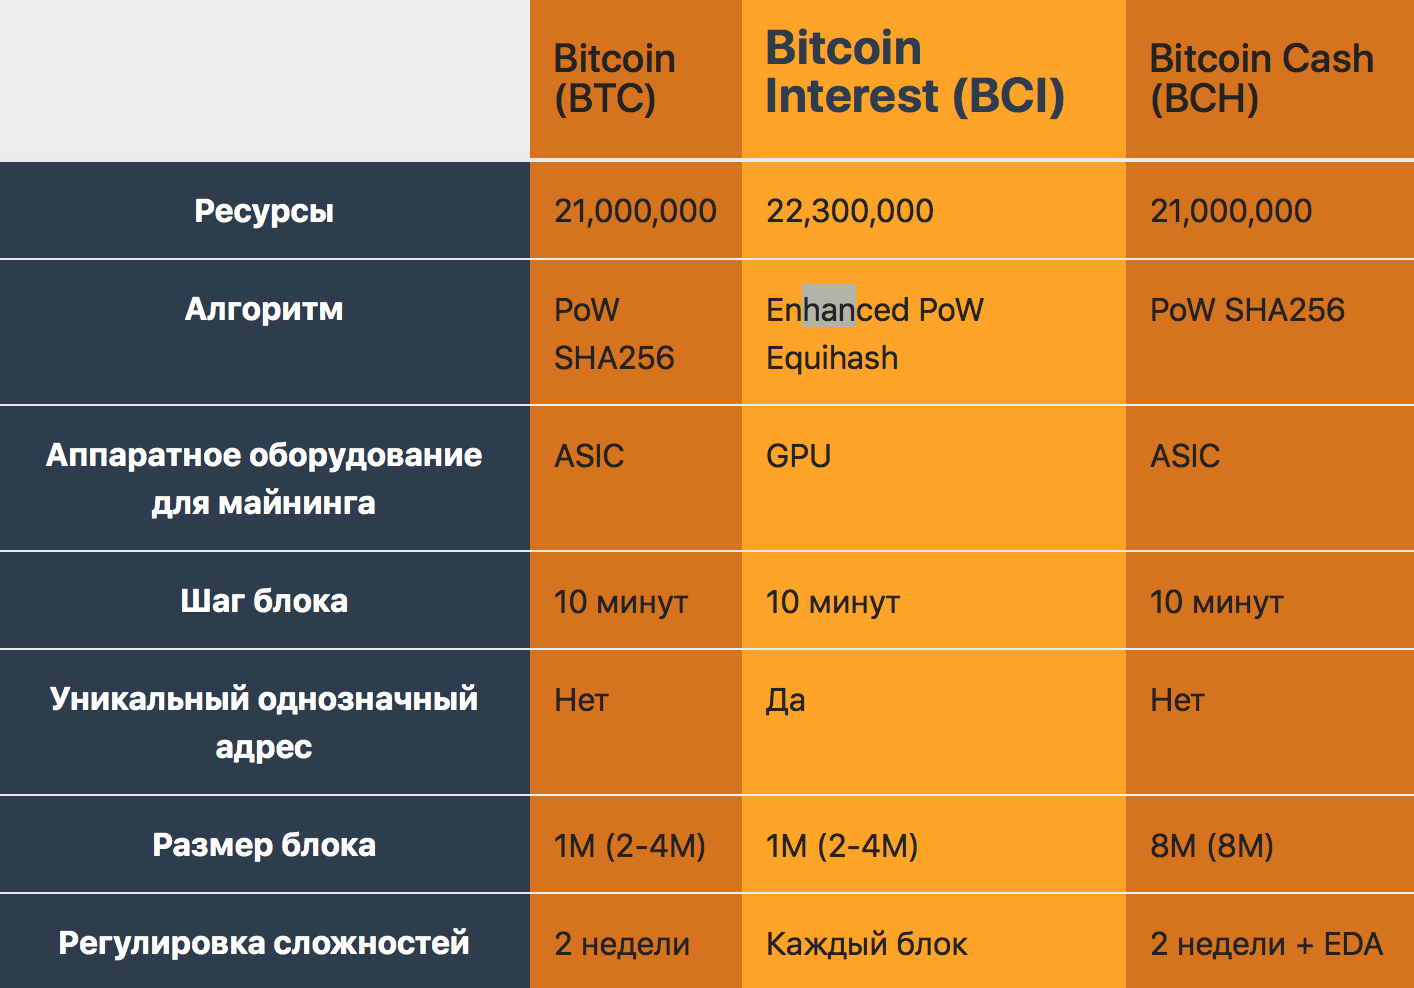 chto-takoe-bitcoin-interest-bitbetnews